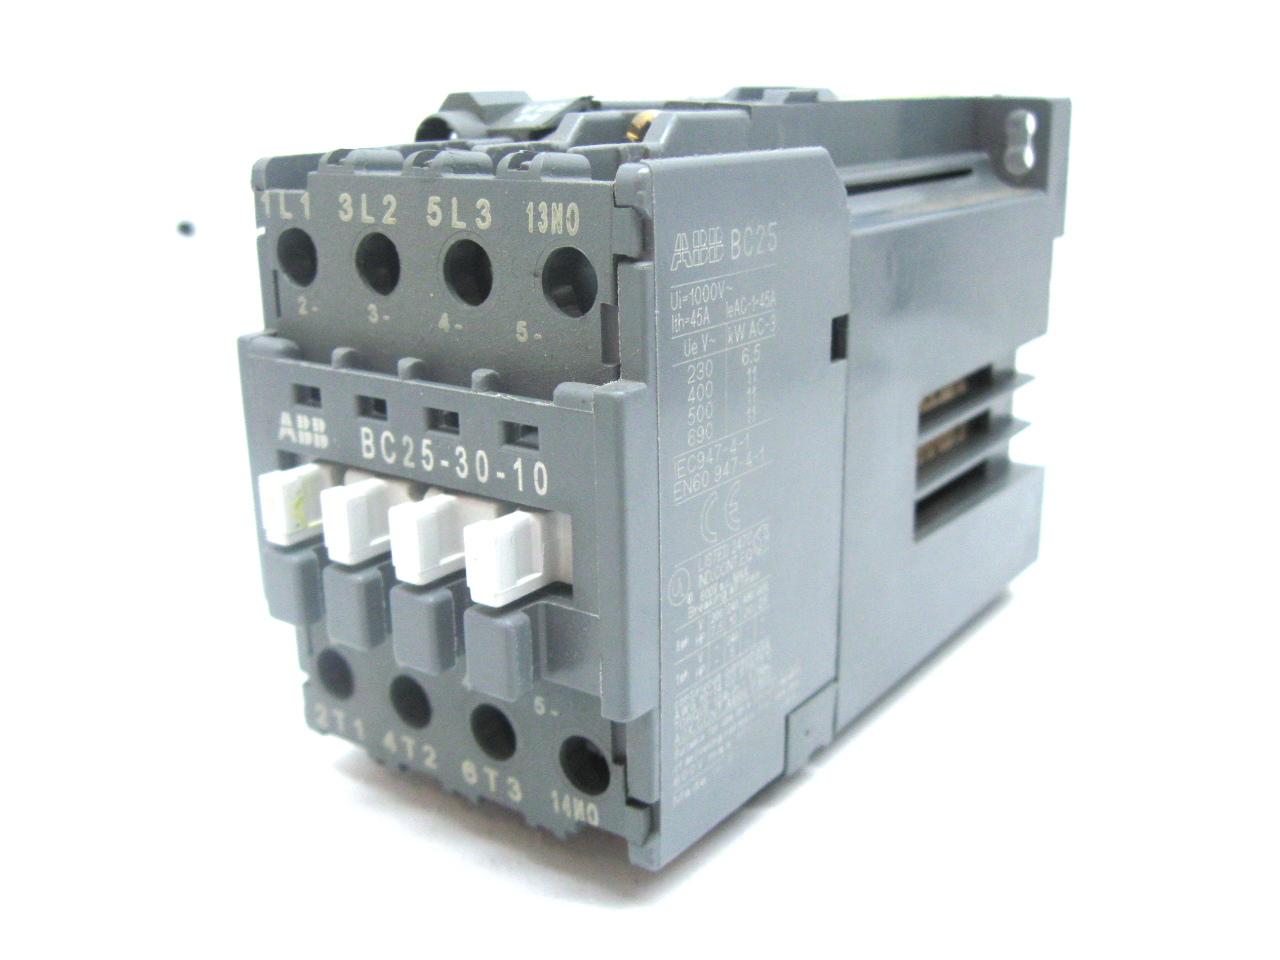 Abb Bc25 30 10 Contactor Motor Starter 24 Vdc Coil 45 Amp